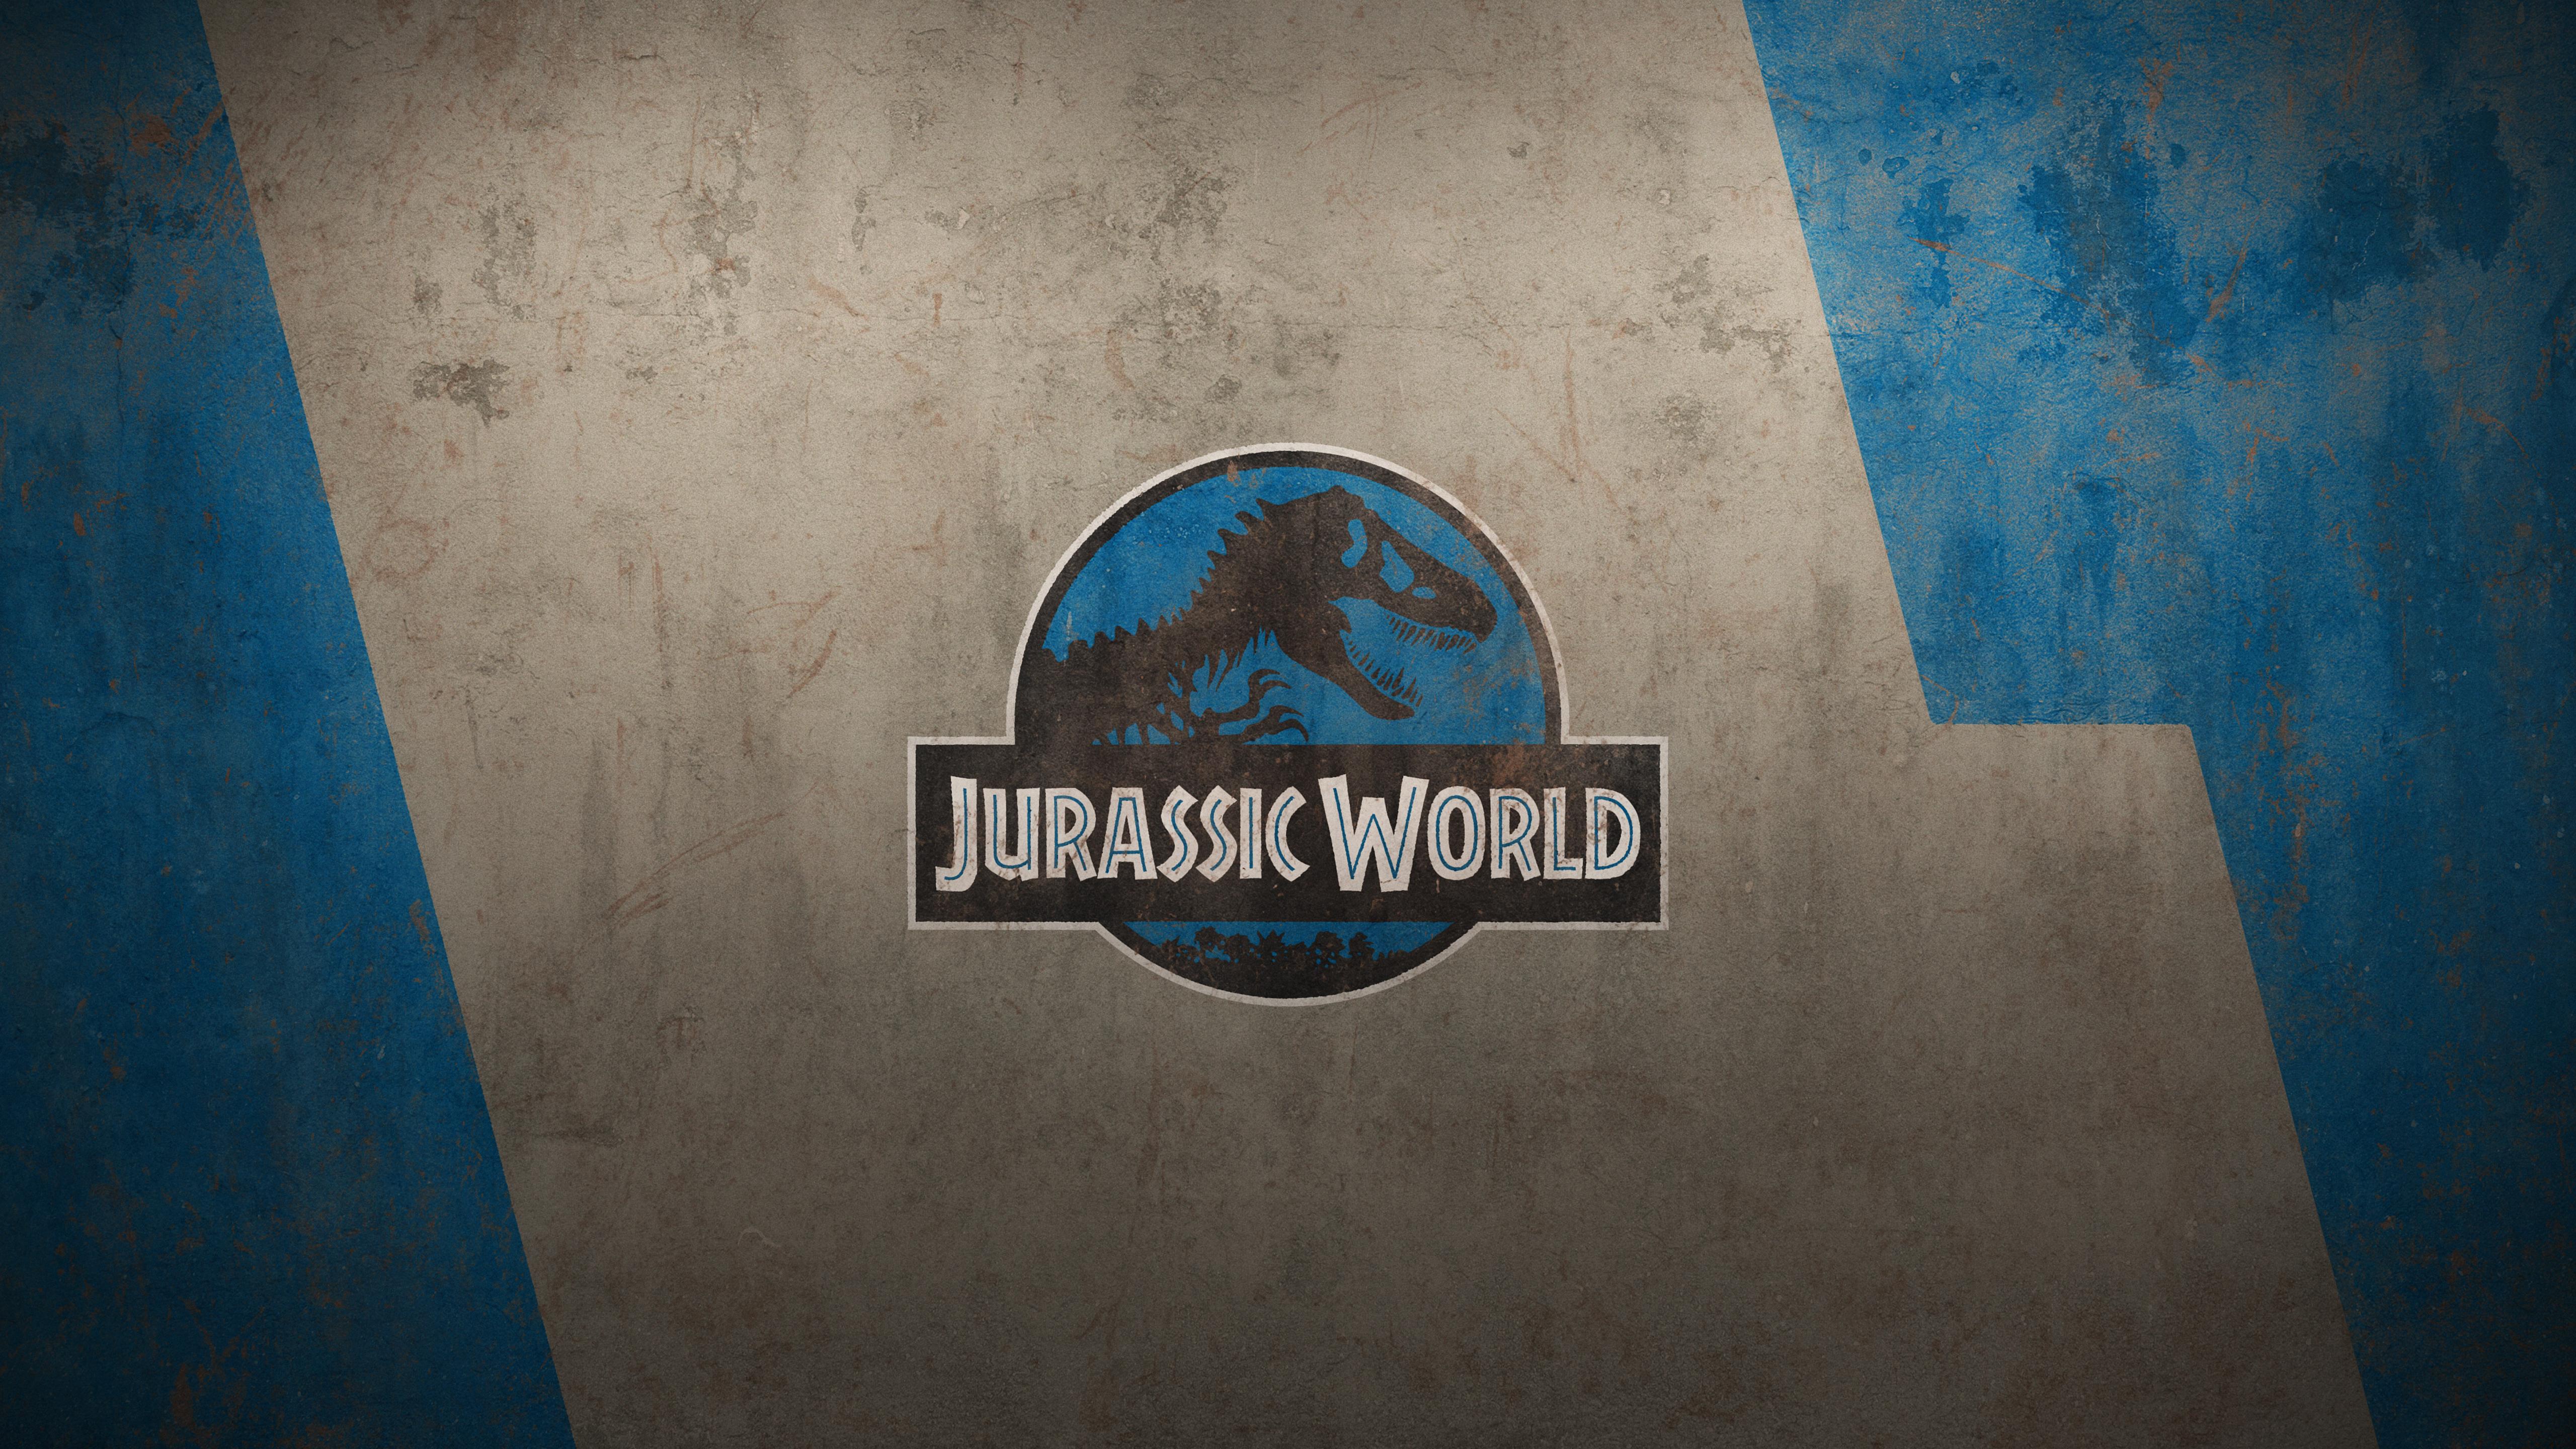 Jurassic World wallpaper 4